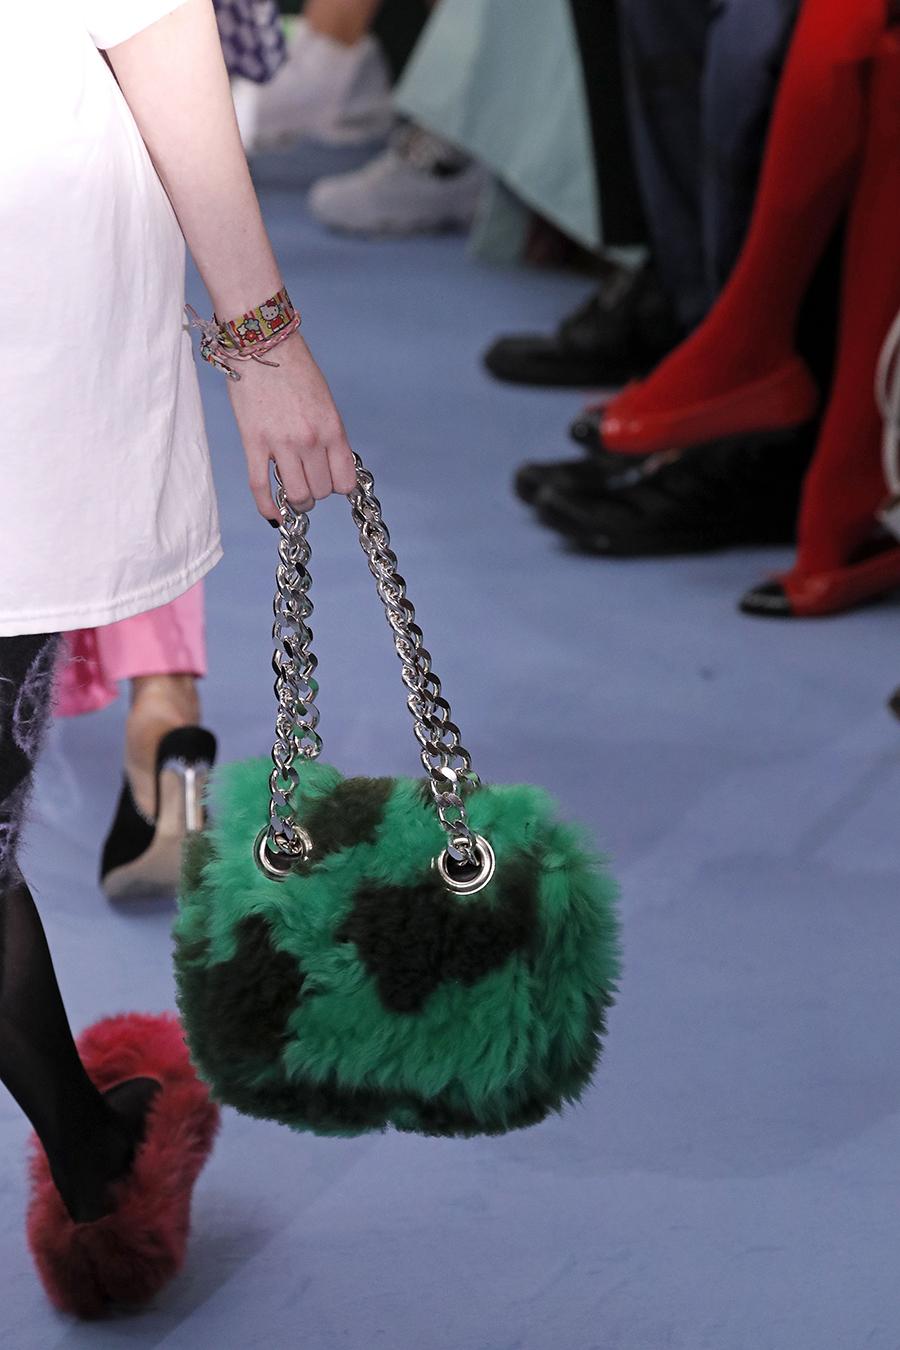 модная сумка мех пушистая мягкая осень зима 2020 2021 зеленая на цепочке